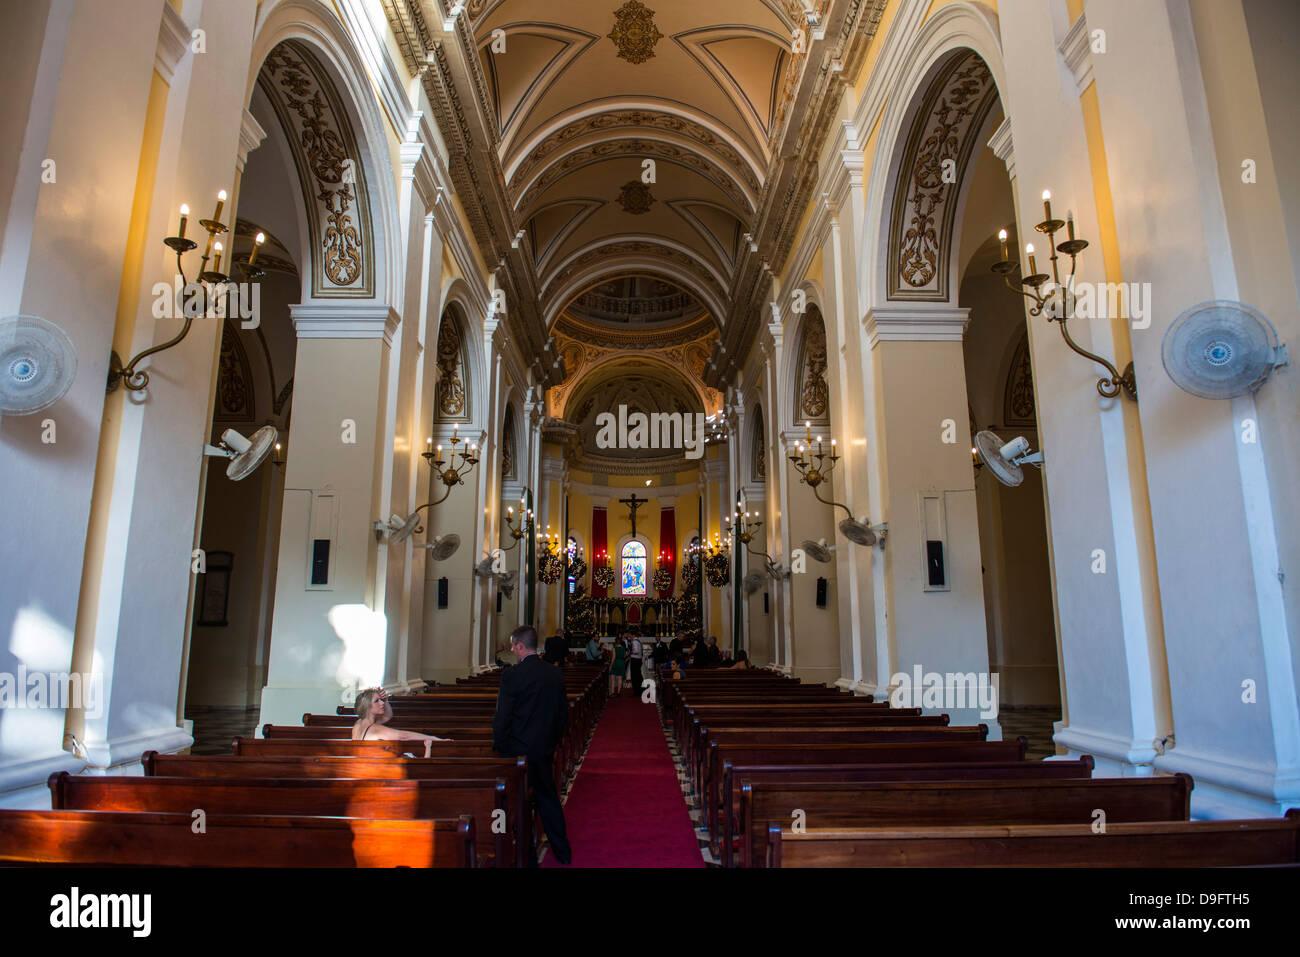 La Santa Catedral San Juan Bautista de Puerto Rico, West Indies, Caribbean - Stock Image